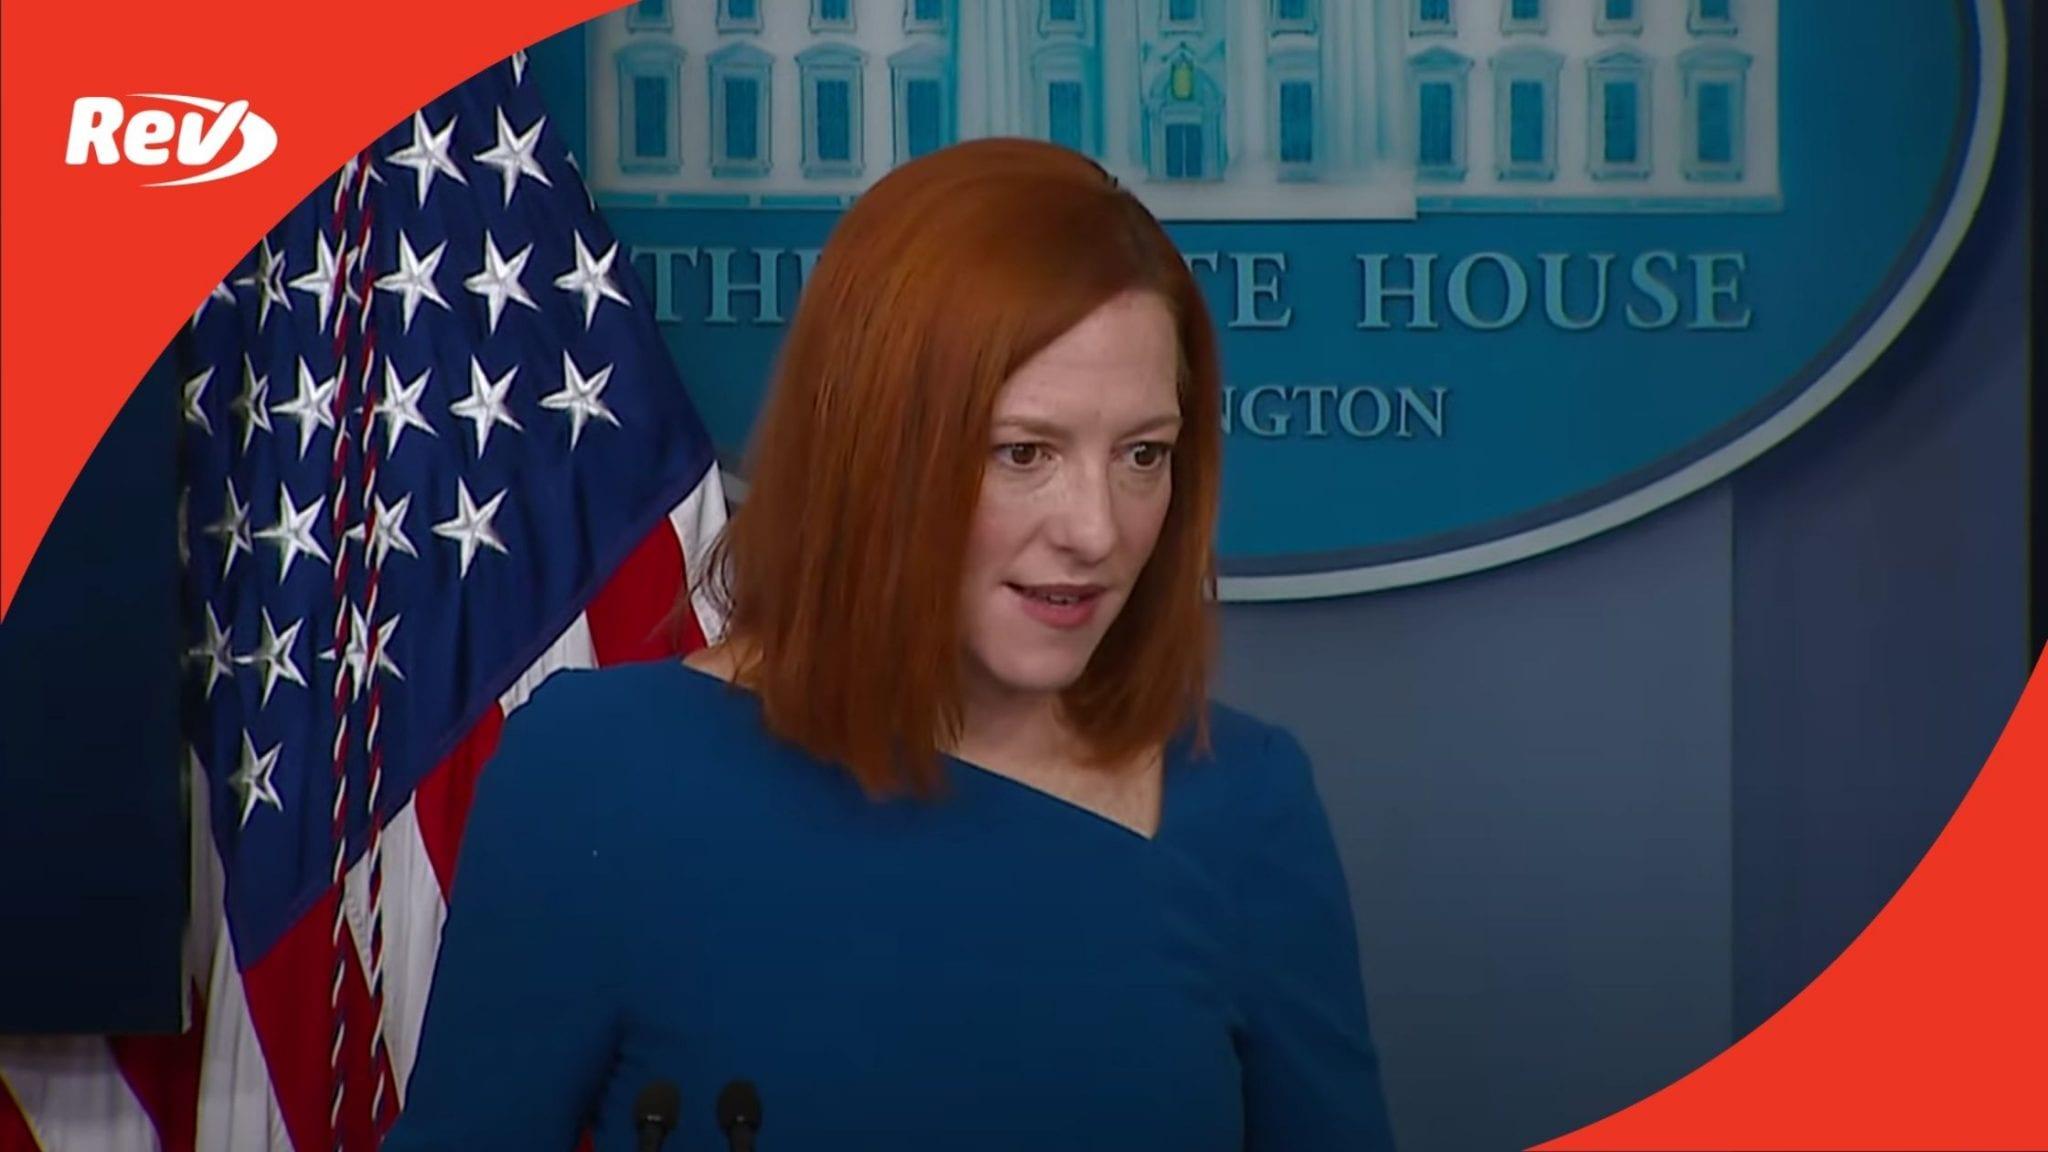 Press Secretary Jen Psaki White House Press Conference Transcript February 22